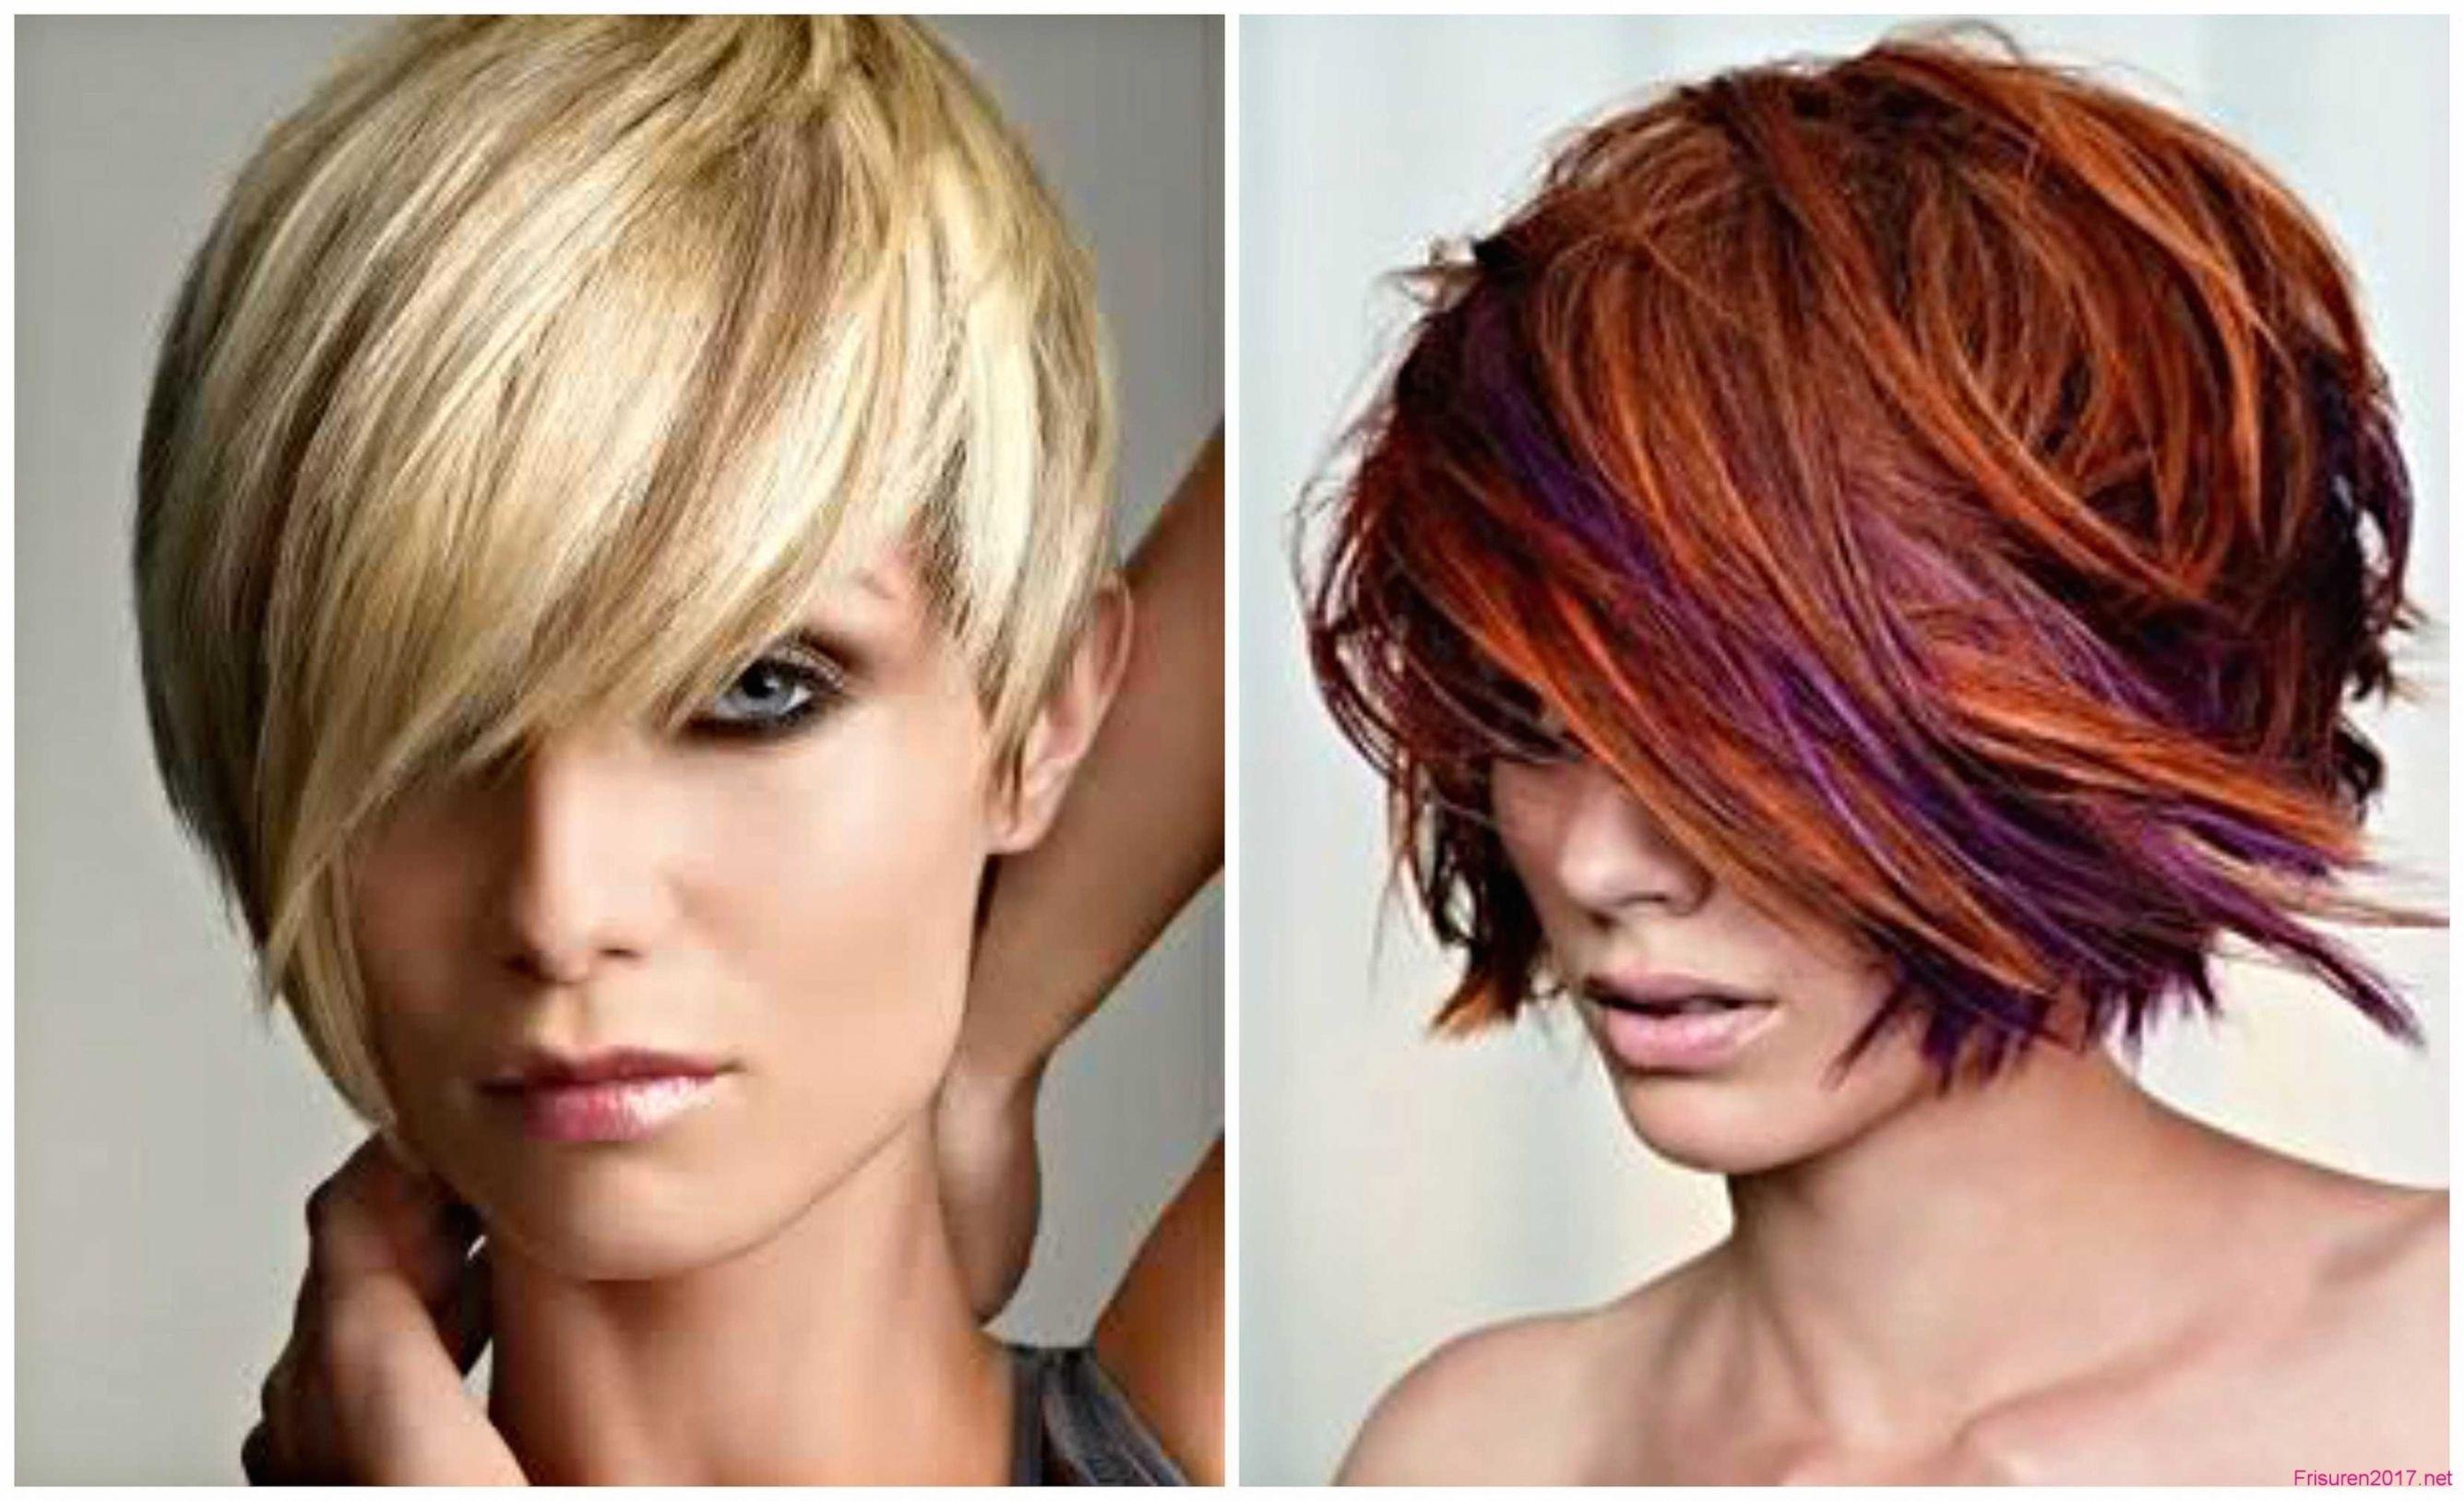 Amazing semilongshorthair hairstyles women short hair are semi